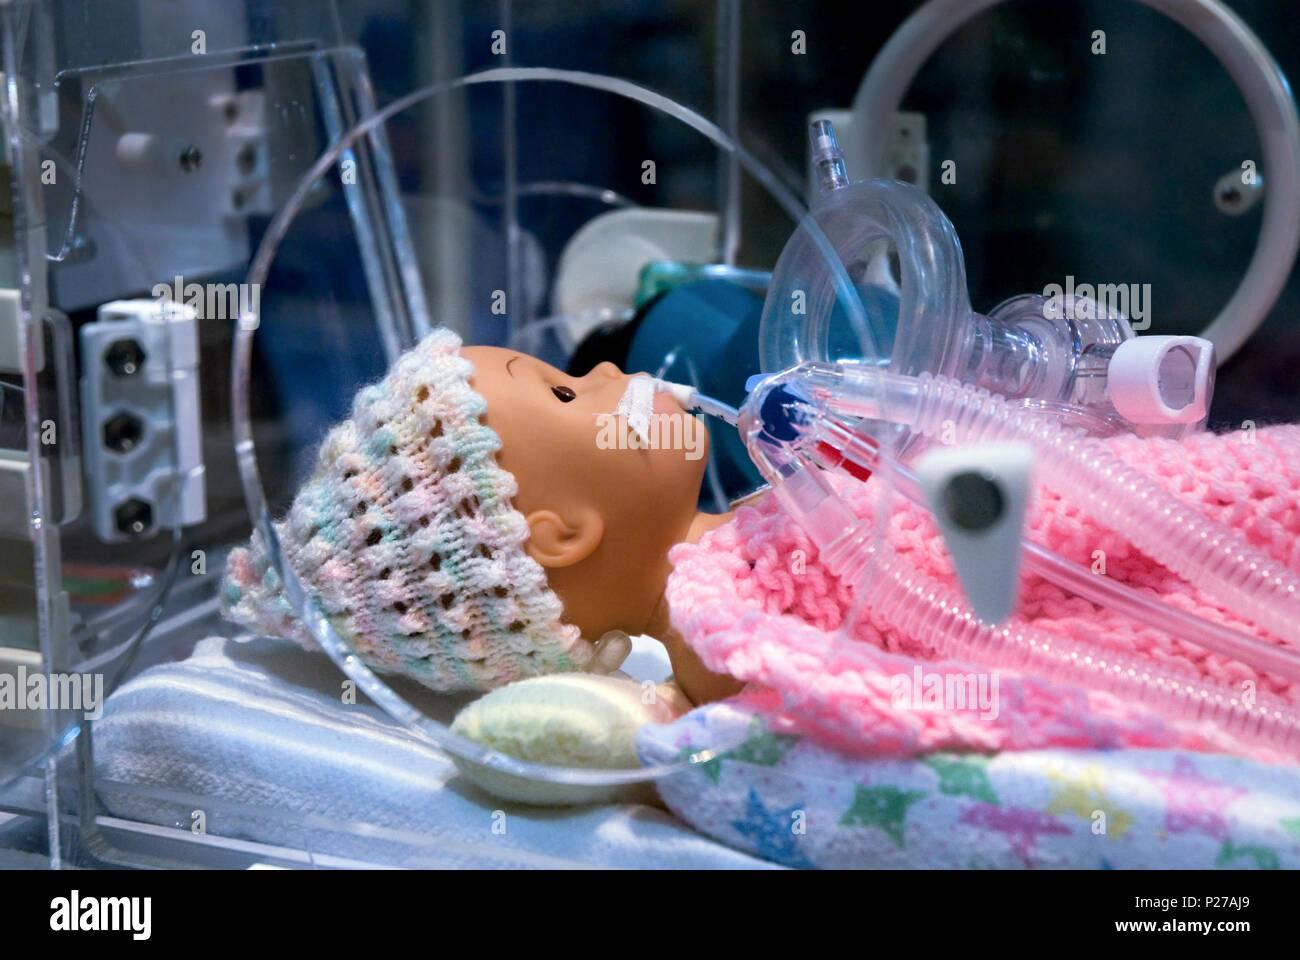 Ambulance Display of Emergency Premature Infant Respiratory Mannequin - Stock Image